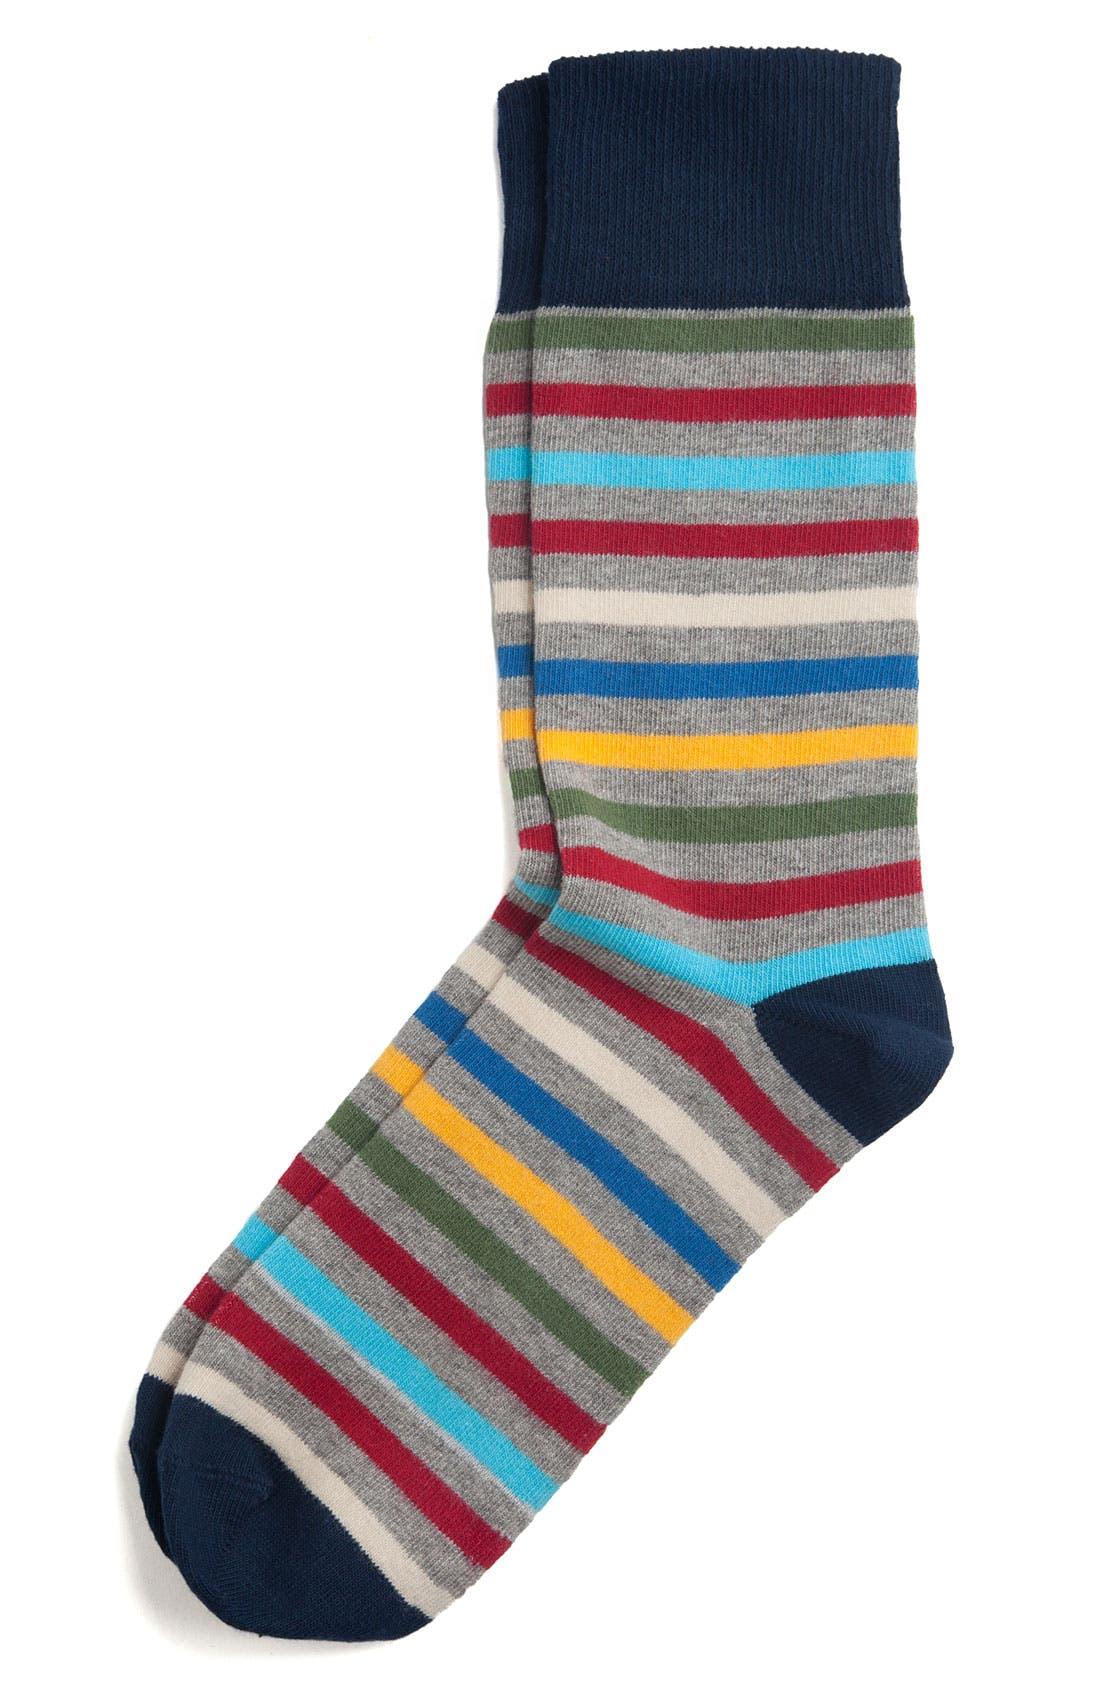 Alternate Image 1 Selected - Pact Multicolored Stripe Socks